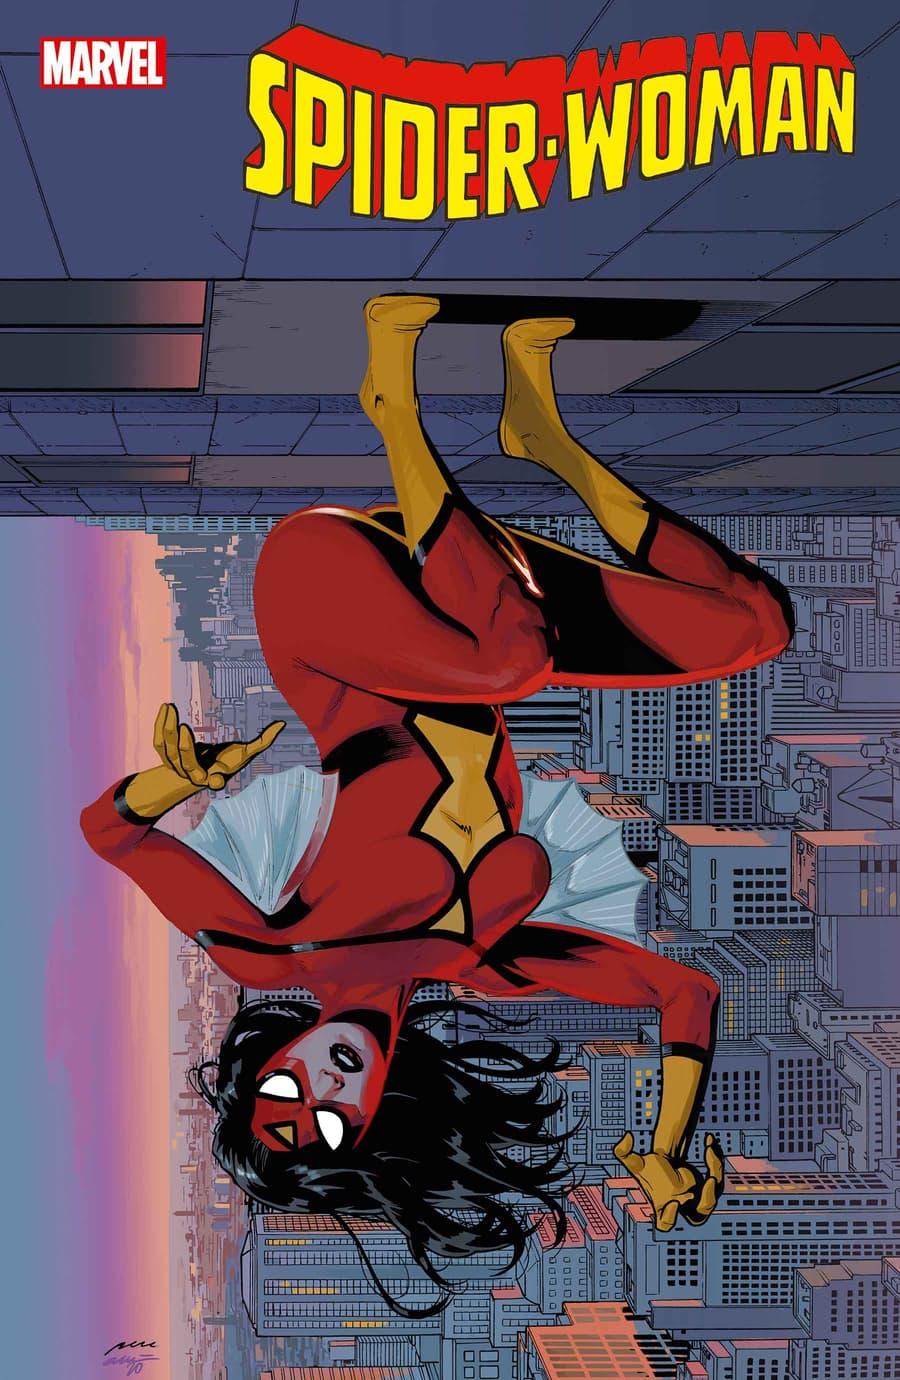 SPIDER-WOMAN#11 variant cover by Pere Pèrez